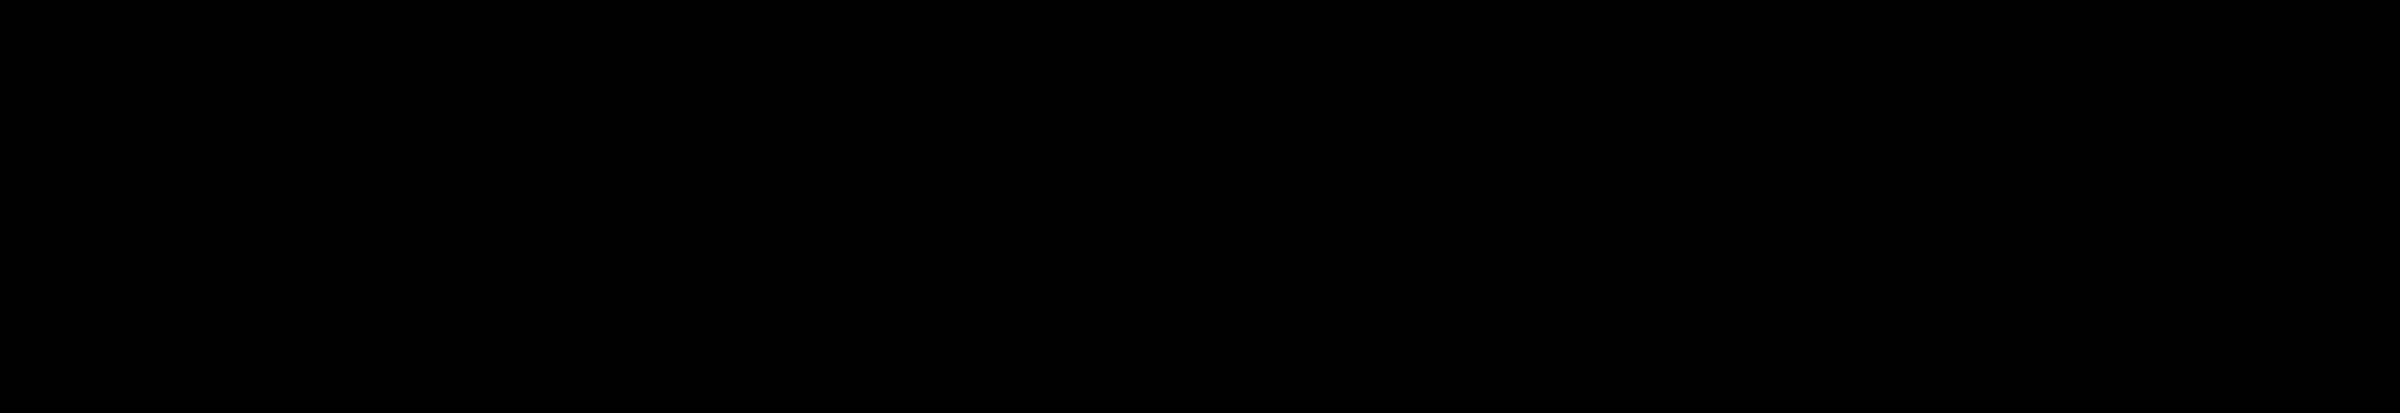 Cinemax Logo PNG Transparent & SVG Vector - Freebie Supply